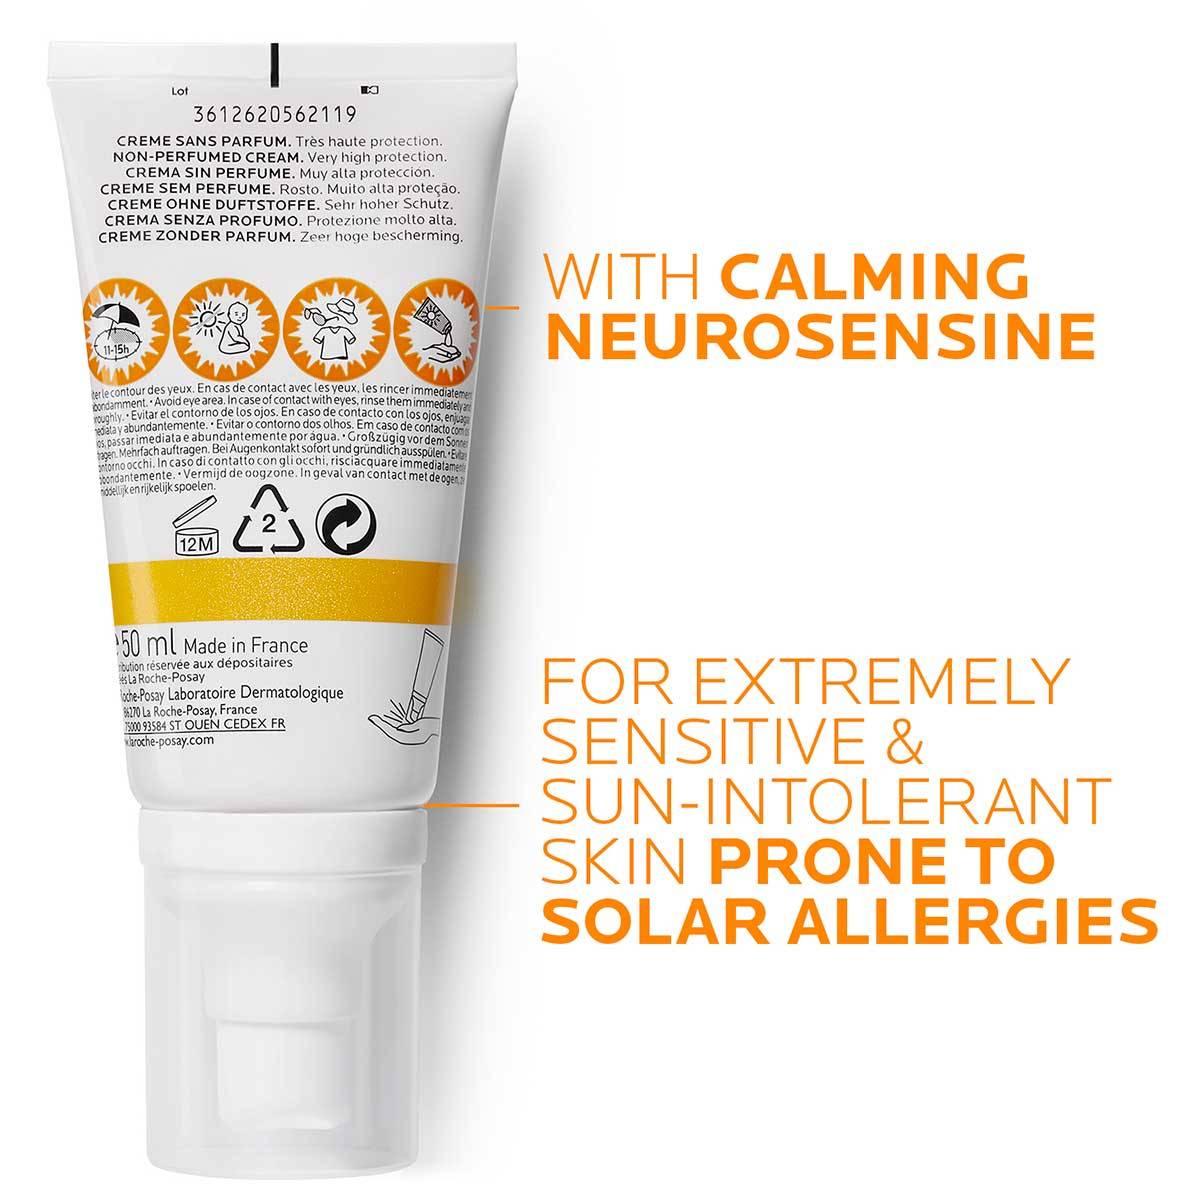 Słońce Anthelios Med Sun Intolerance Spf 50 50 ml | La Roche Posay 2